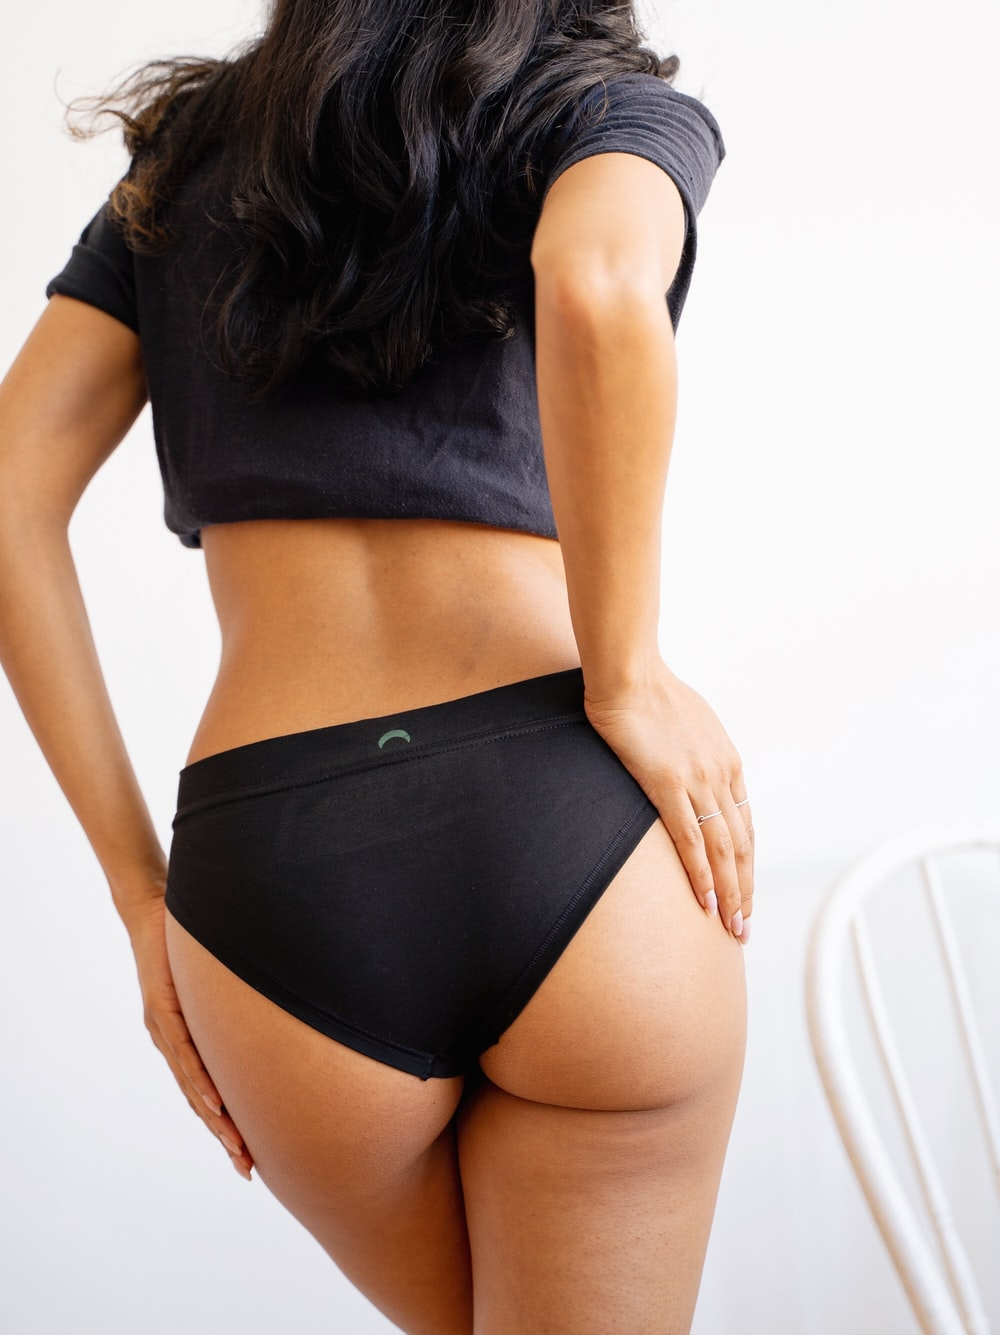 woman in black crop top and black panty